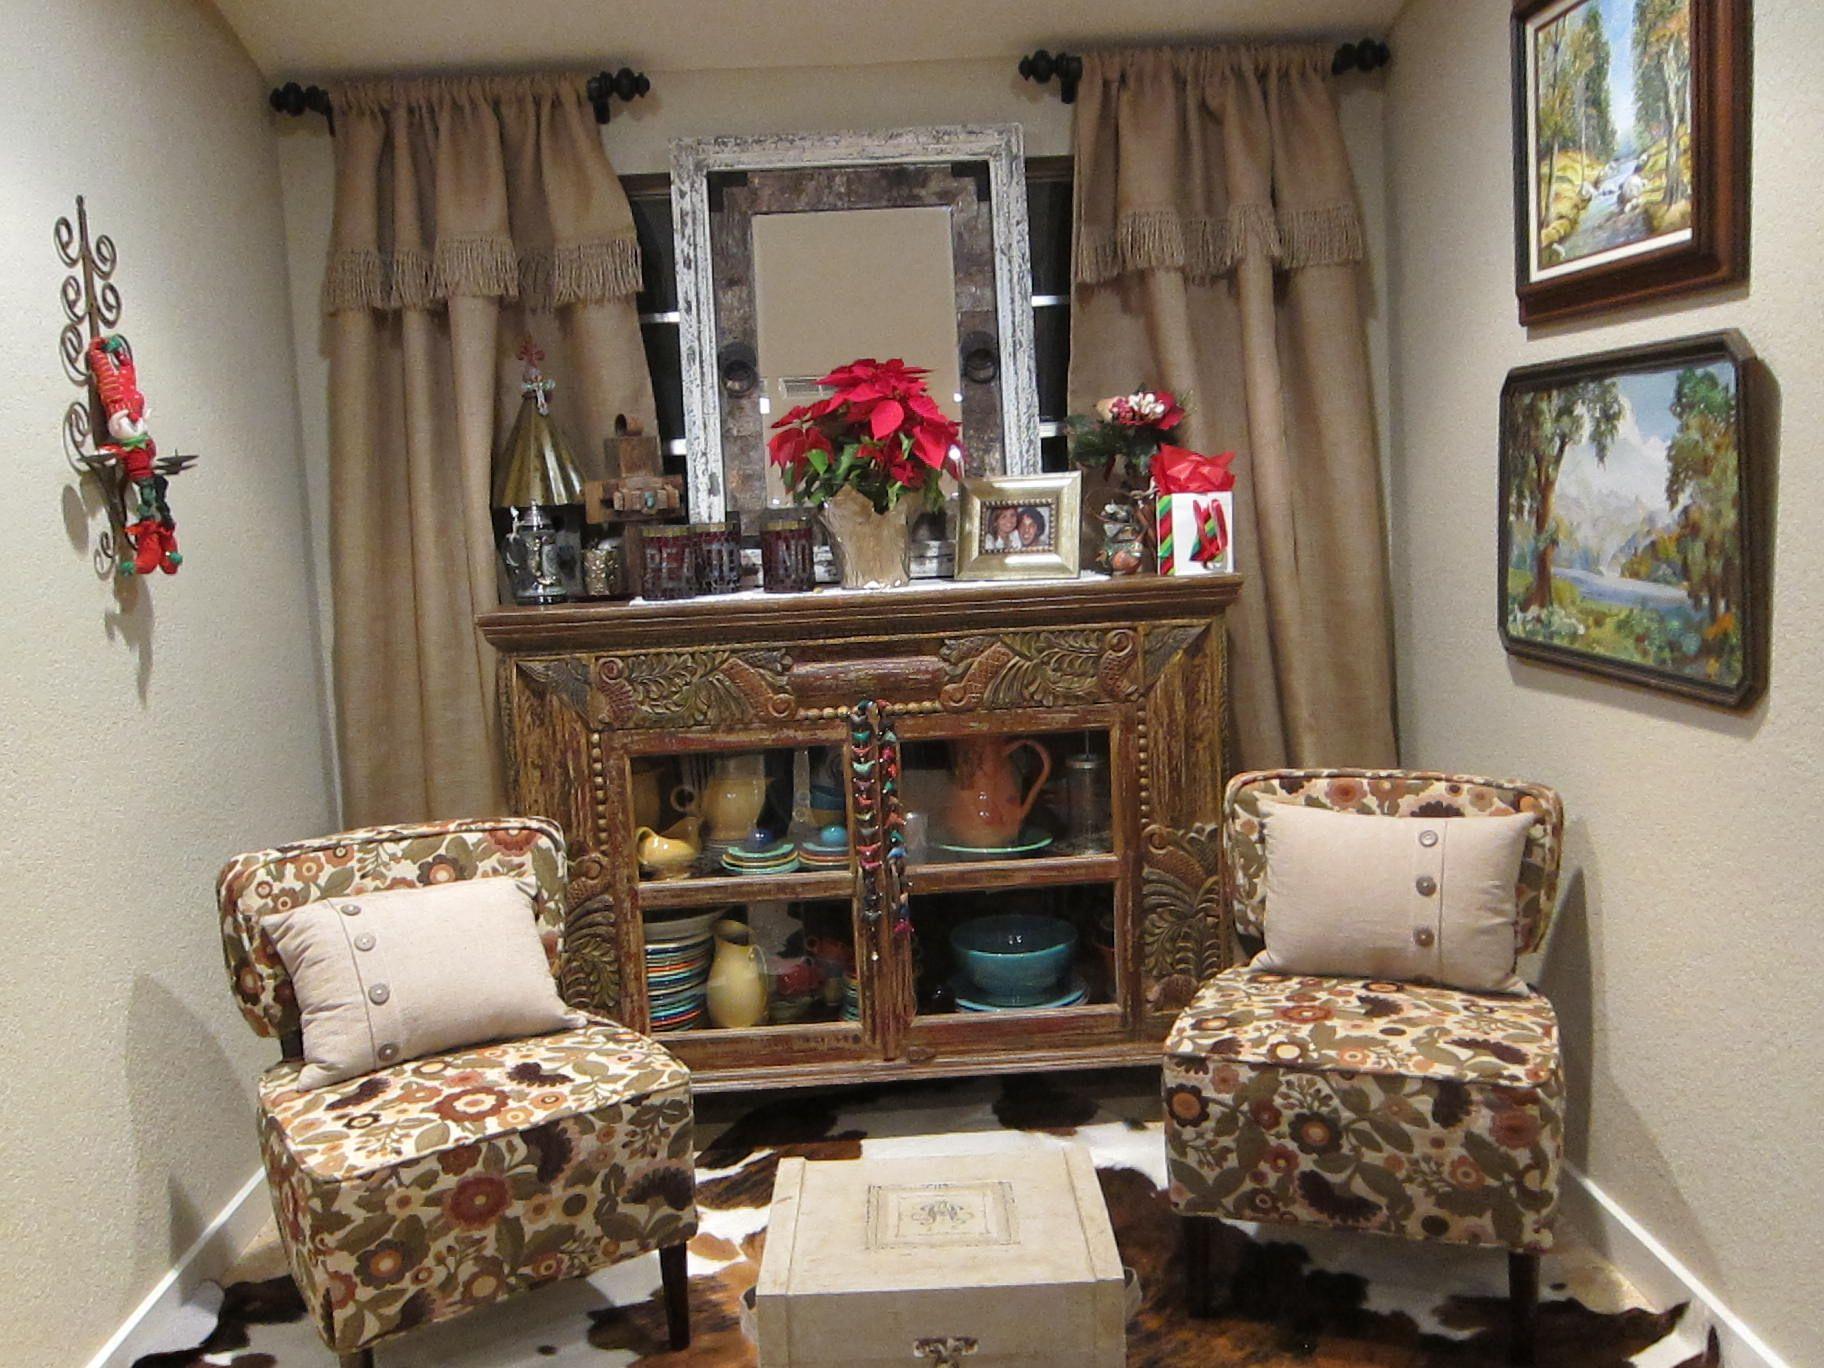 Breakfast area into sitting area | Cozy house, Decor, Home ...